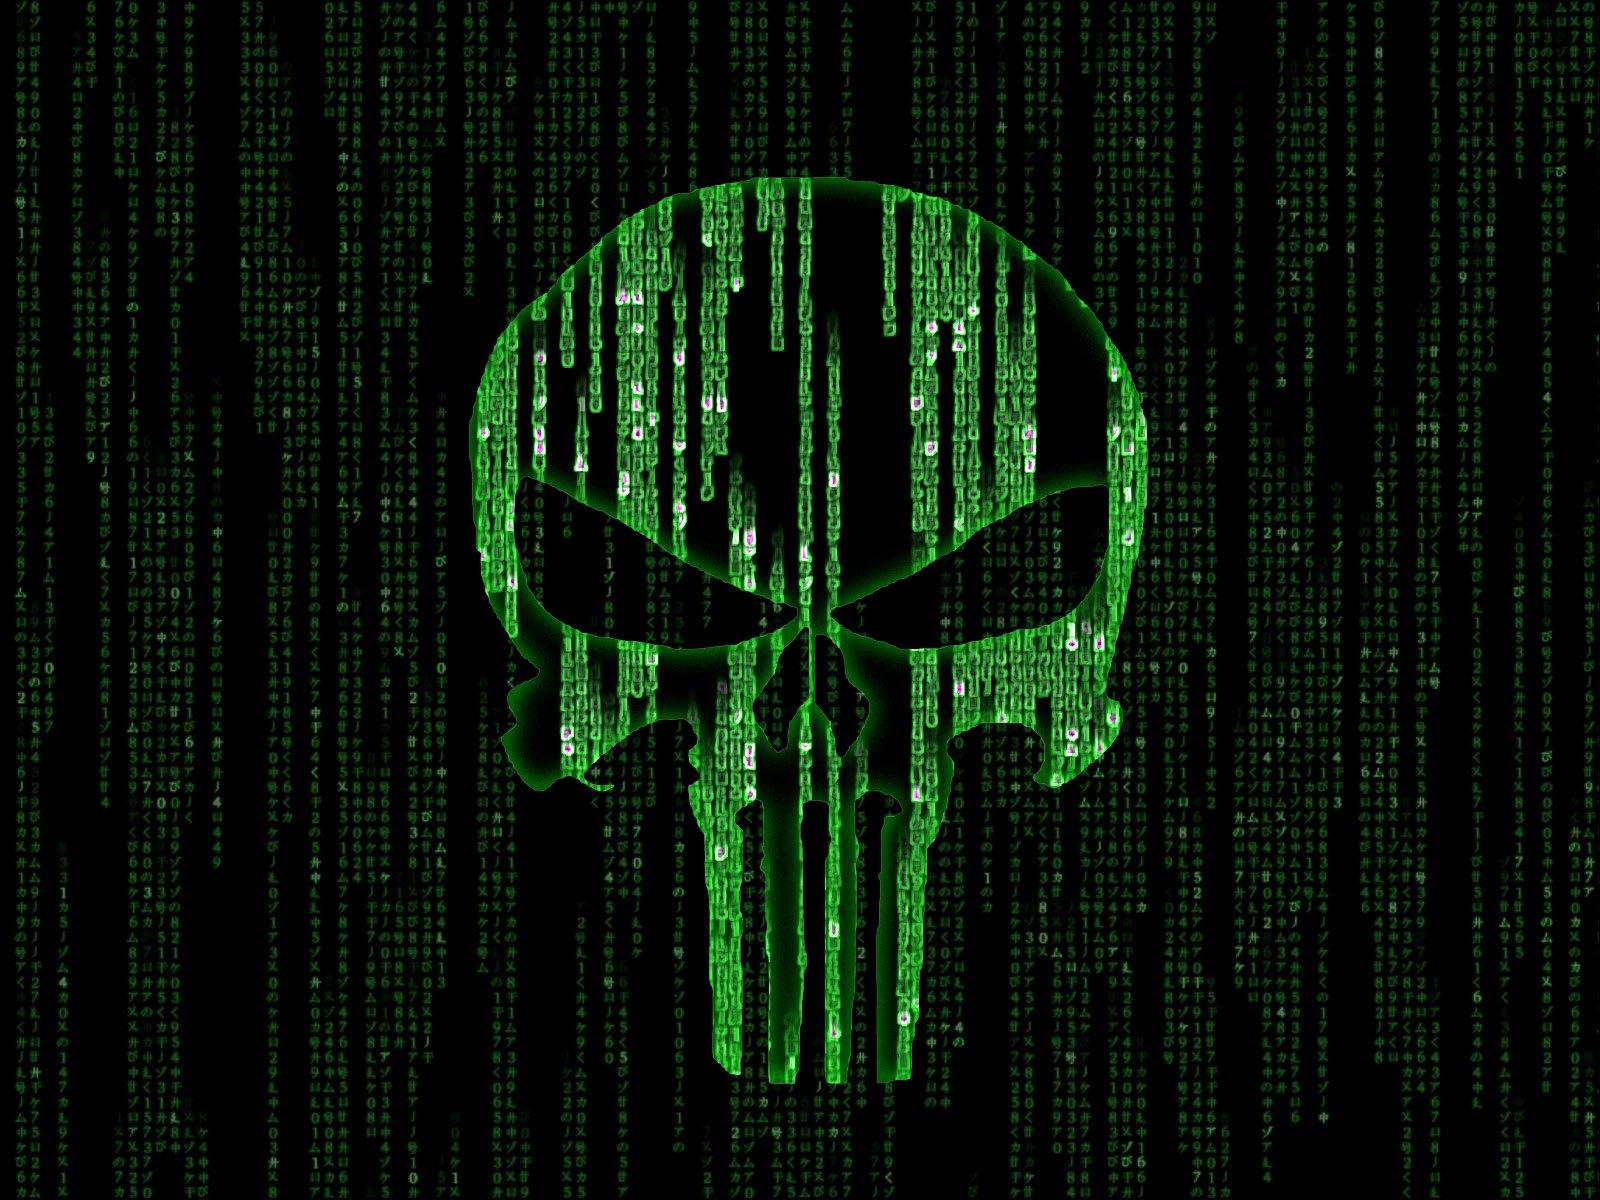 Matrix meets Punisher by kmfdmk 1600x1200